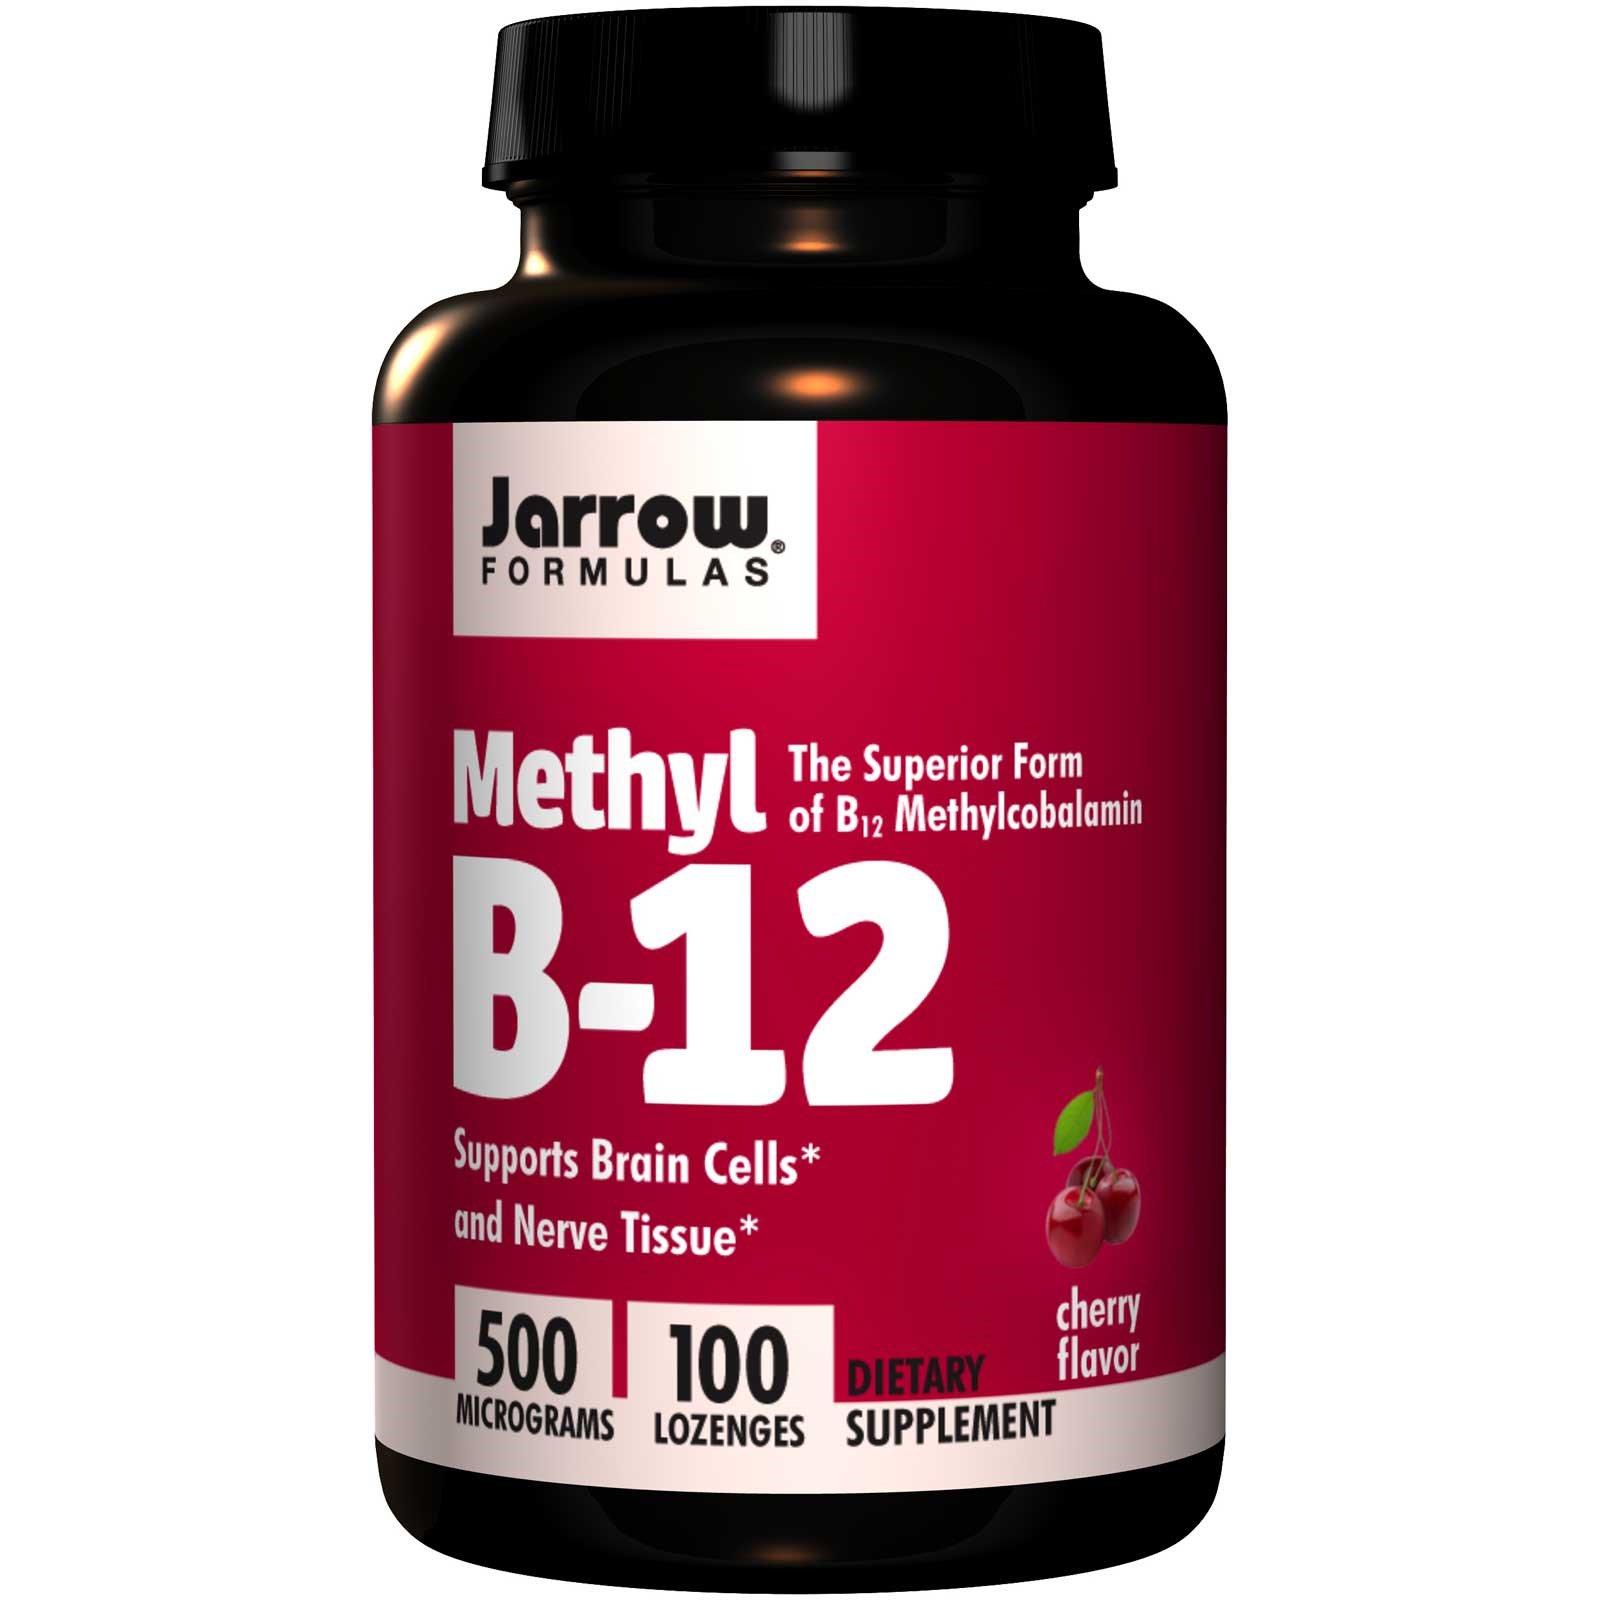 Jarrow Formulas, Метил B-12, со вкусом вишни, 500 мкг, 100 леденцов